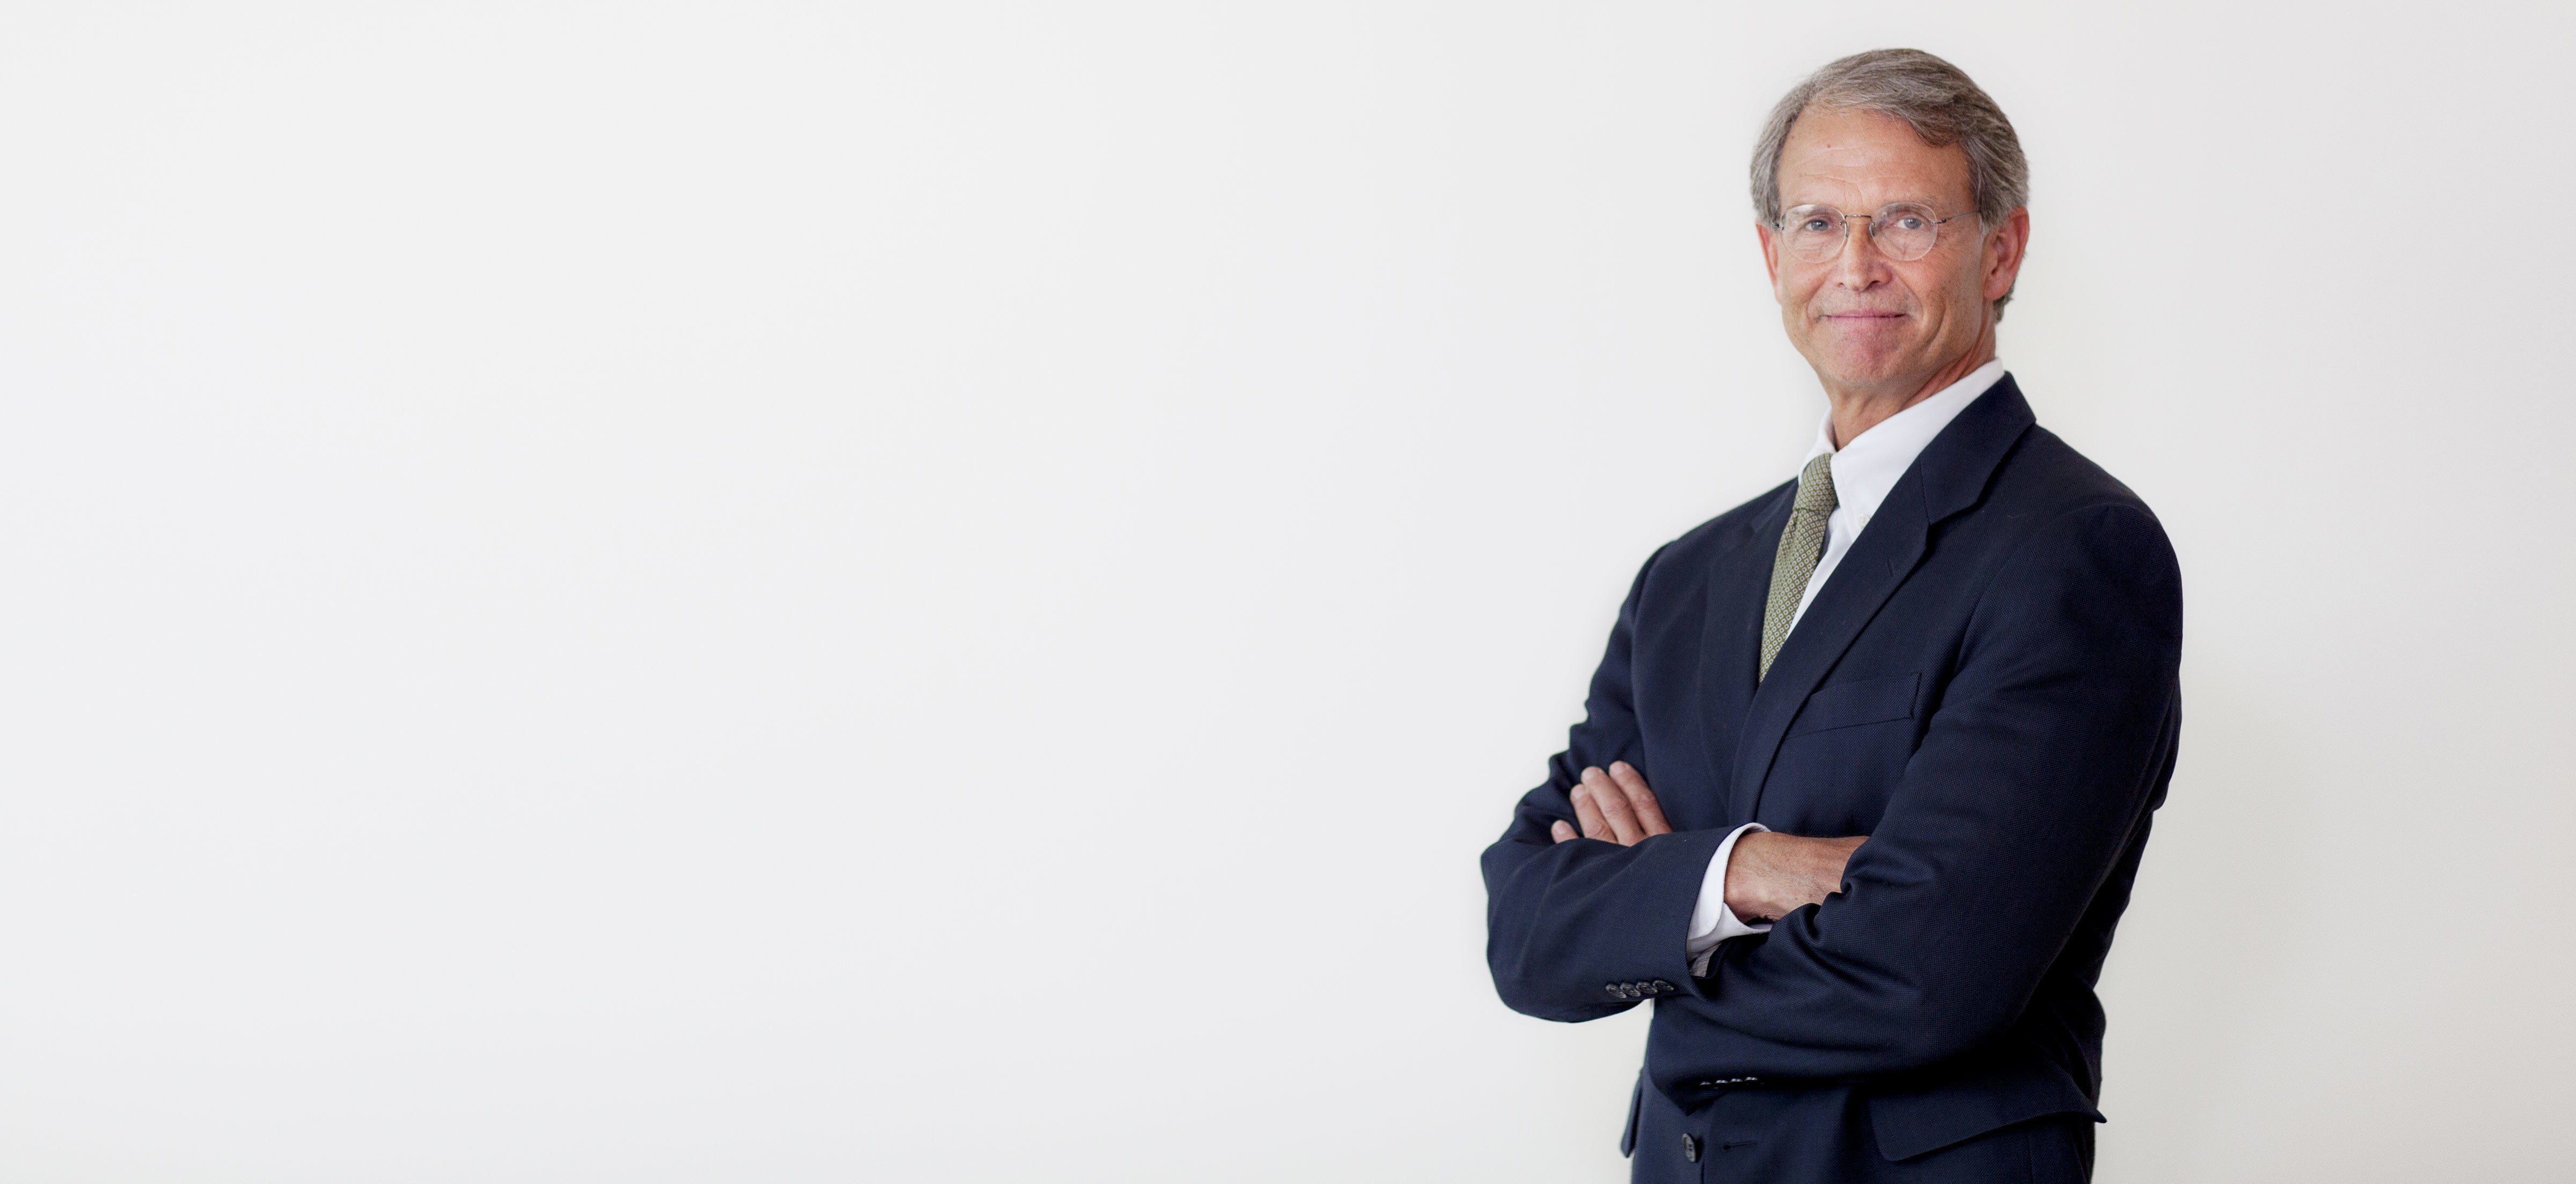 Bo Bobbitt | Leading Attorney in Value-Based Health Care